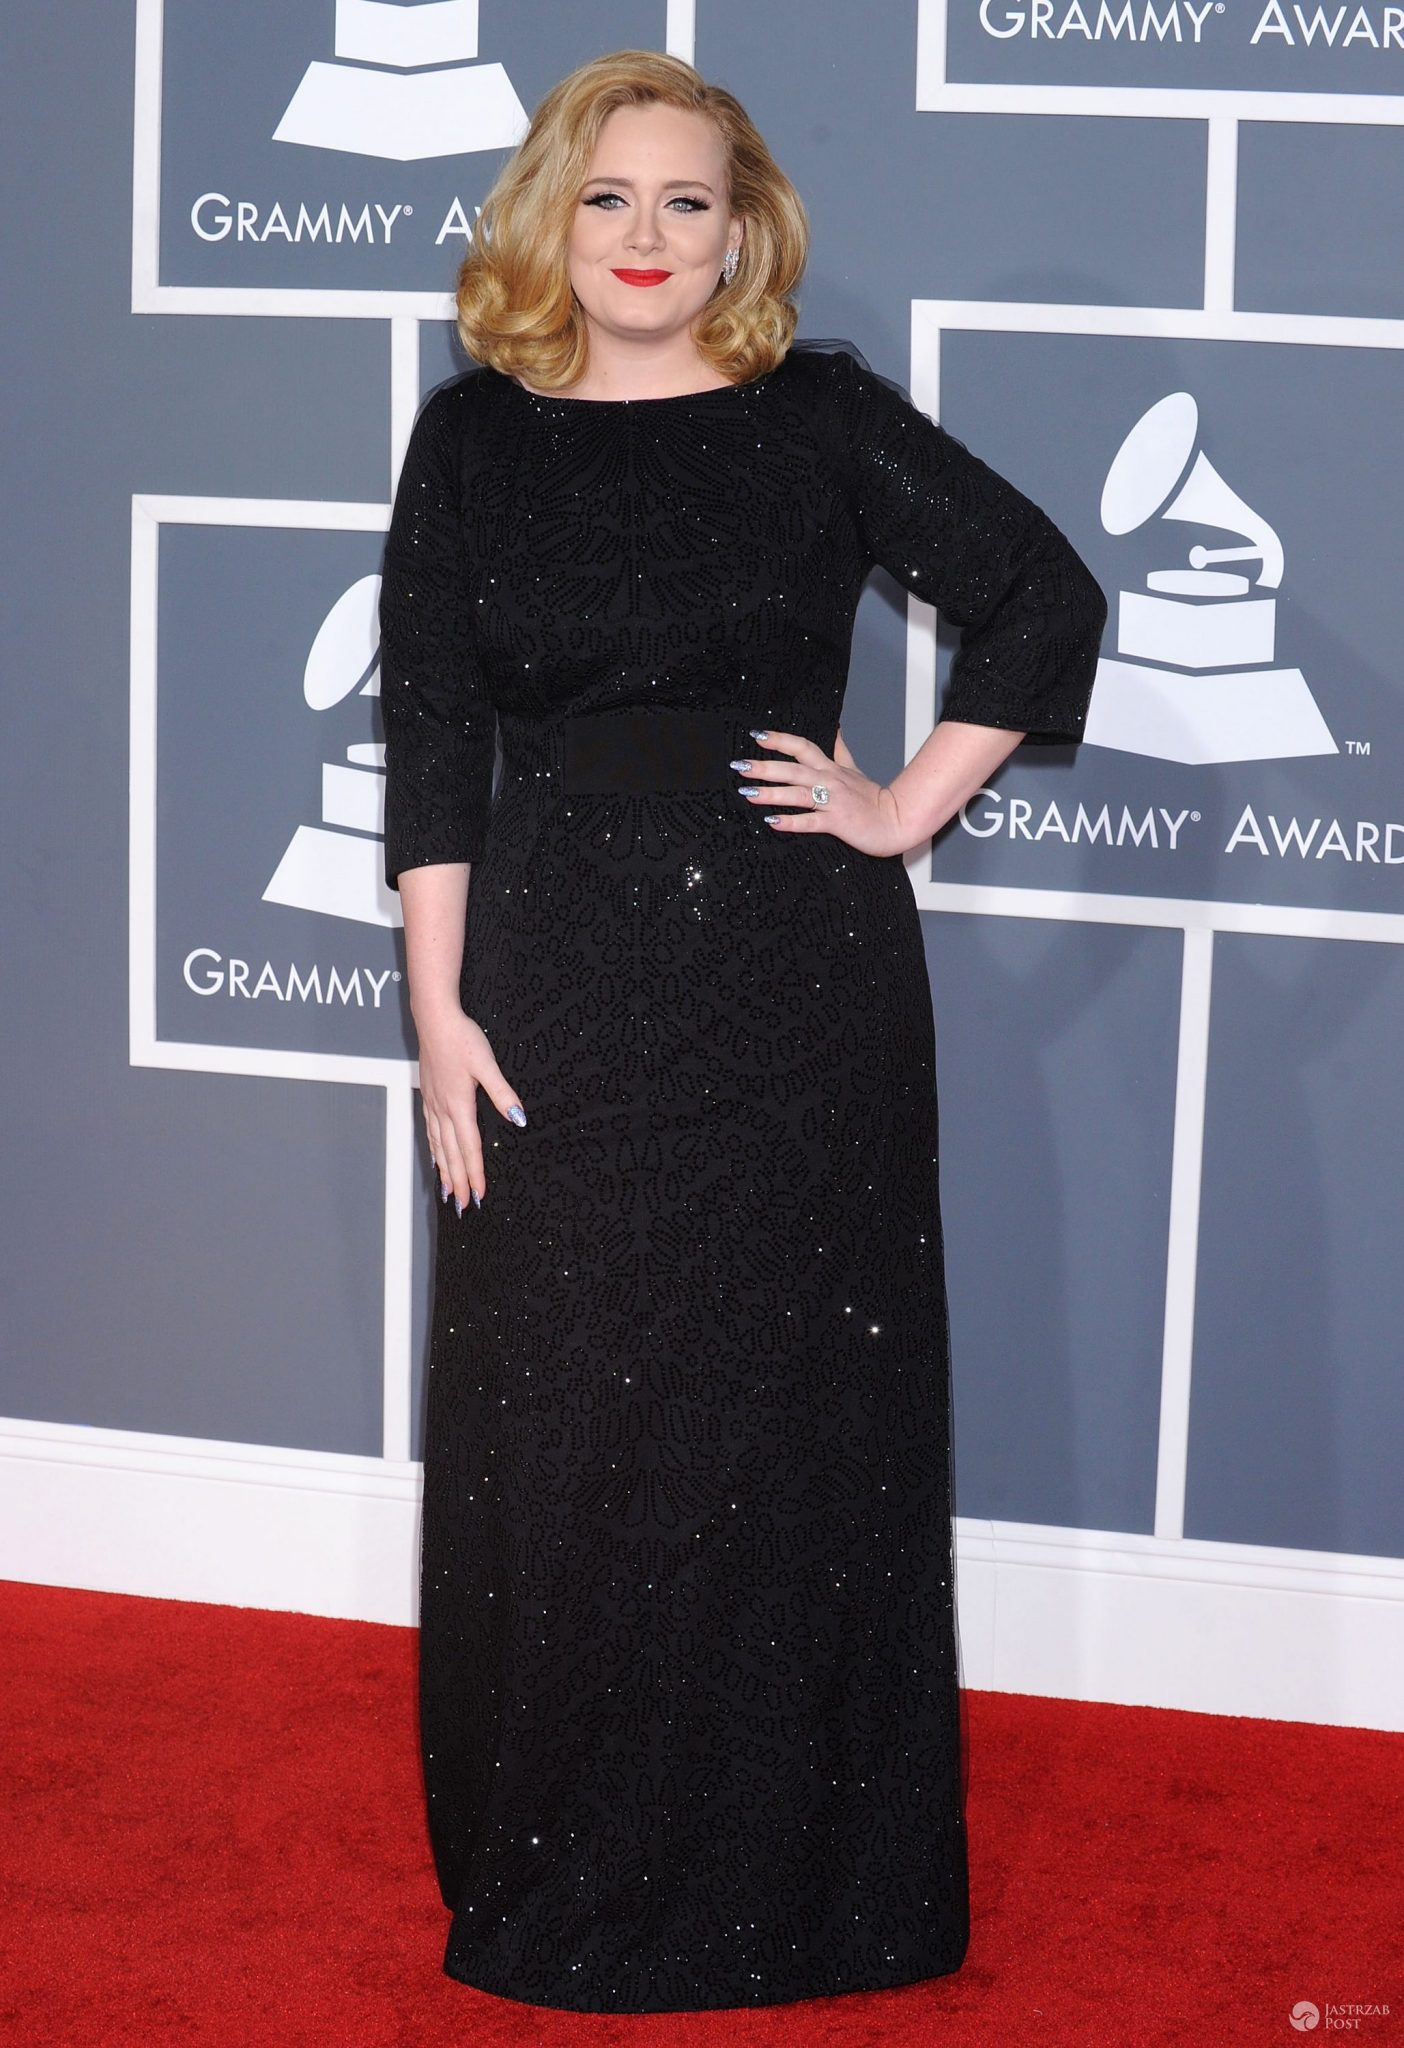 Adele (w sukni Giorgio Armani), Grammy 2012 (fot. ONS)